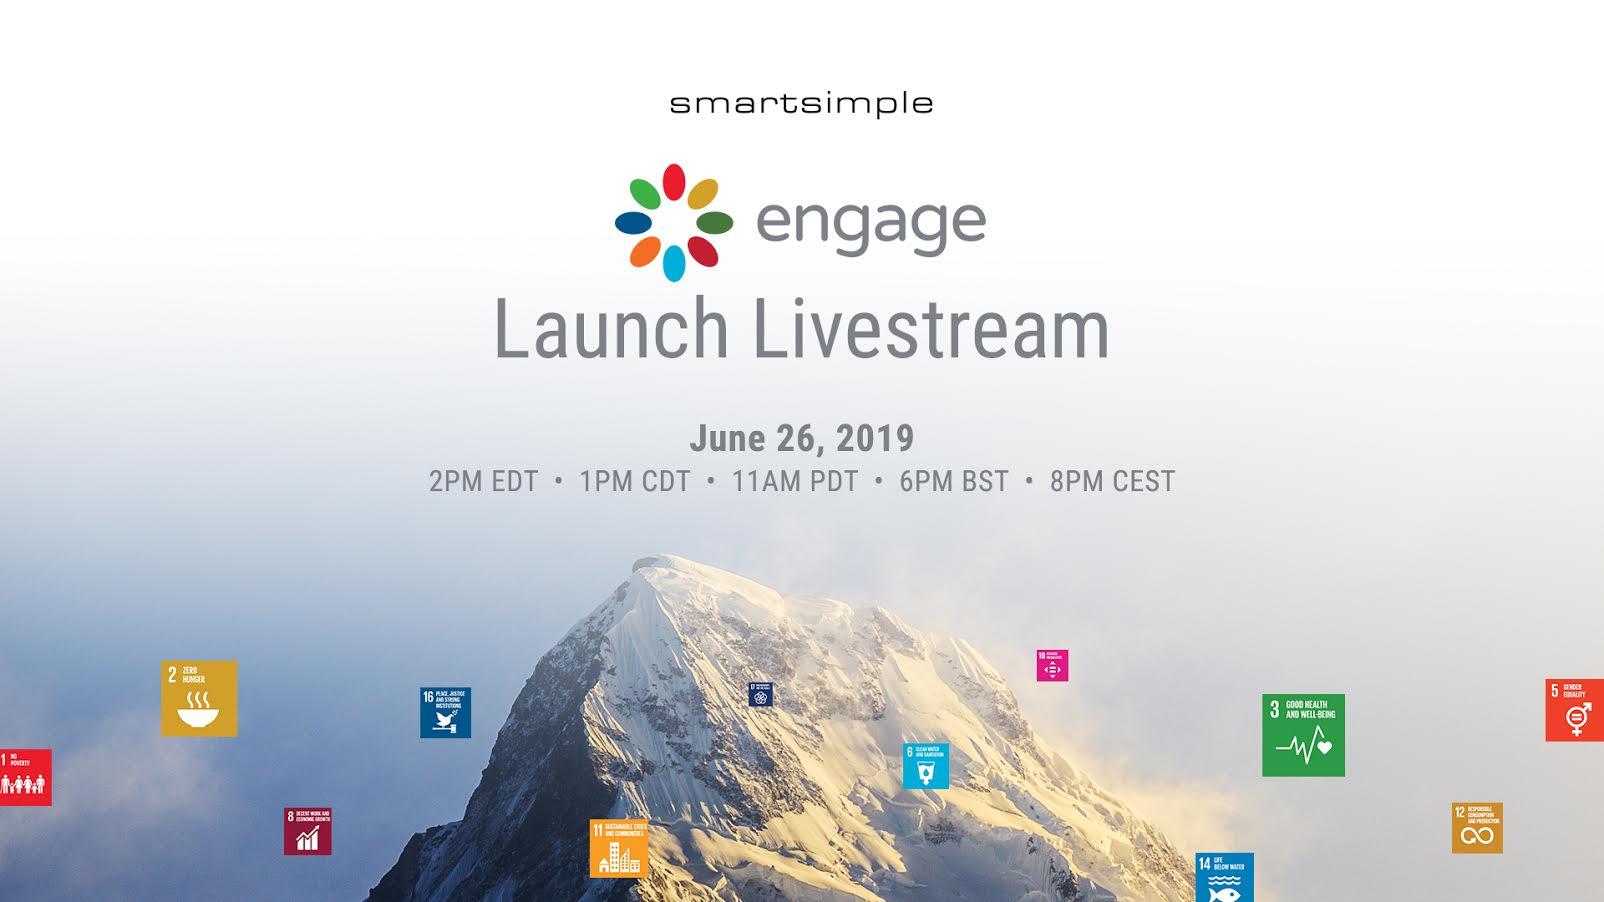 Watch SmartSimple's Engage Livestream Launch Event